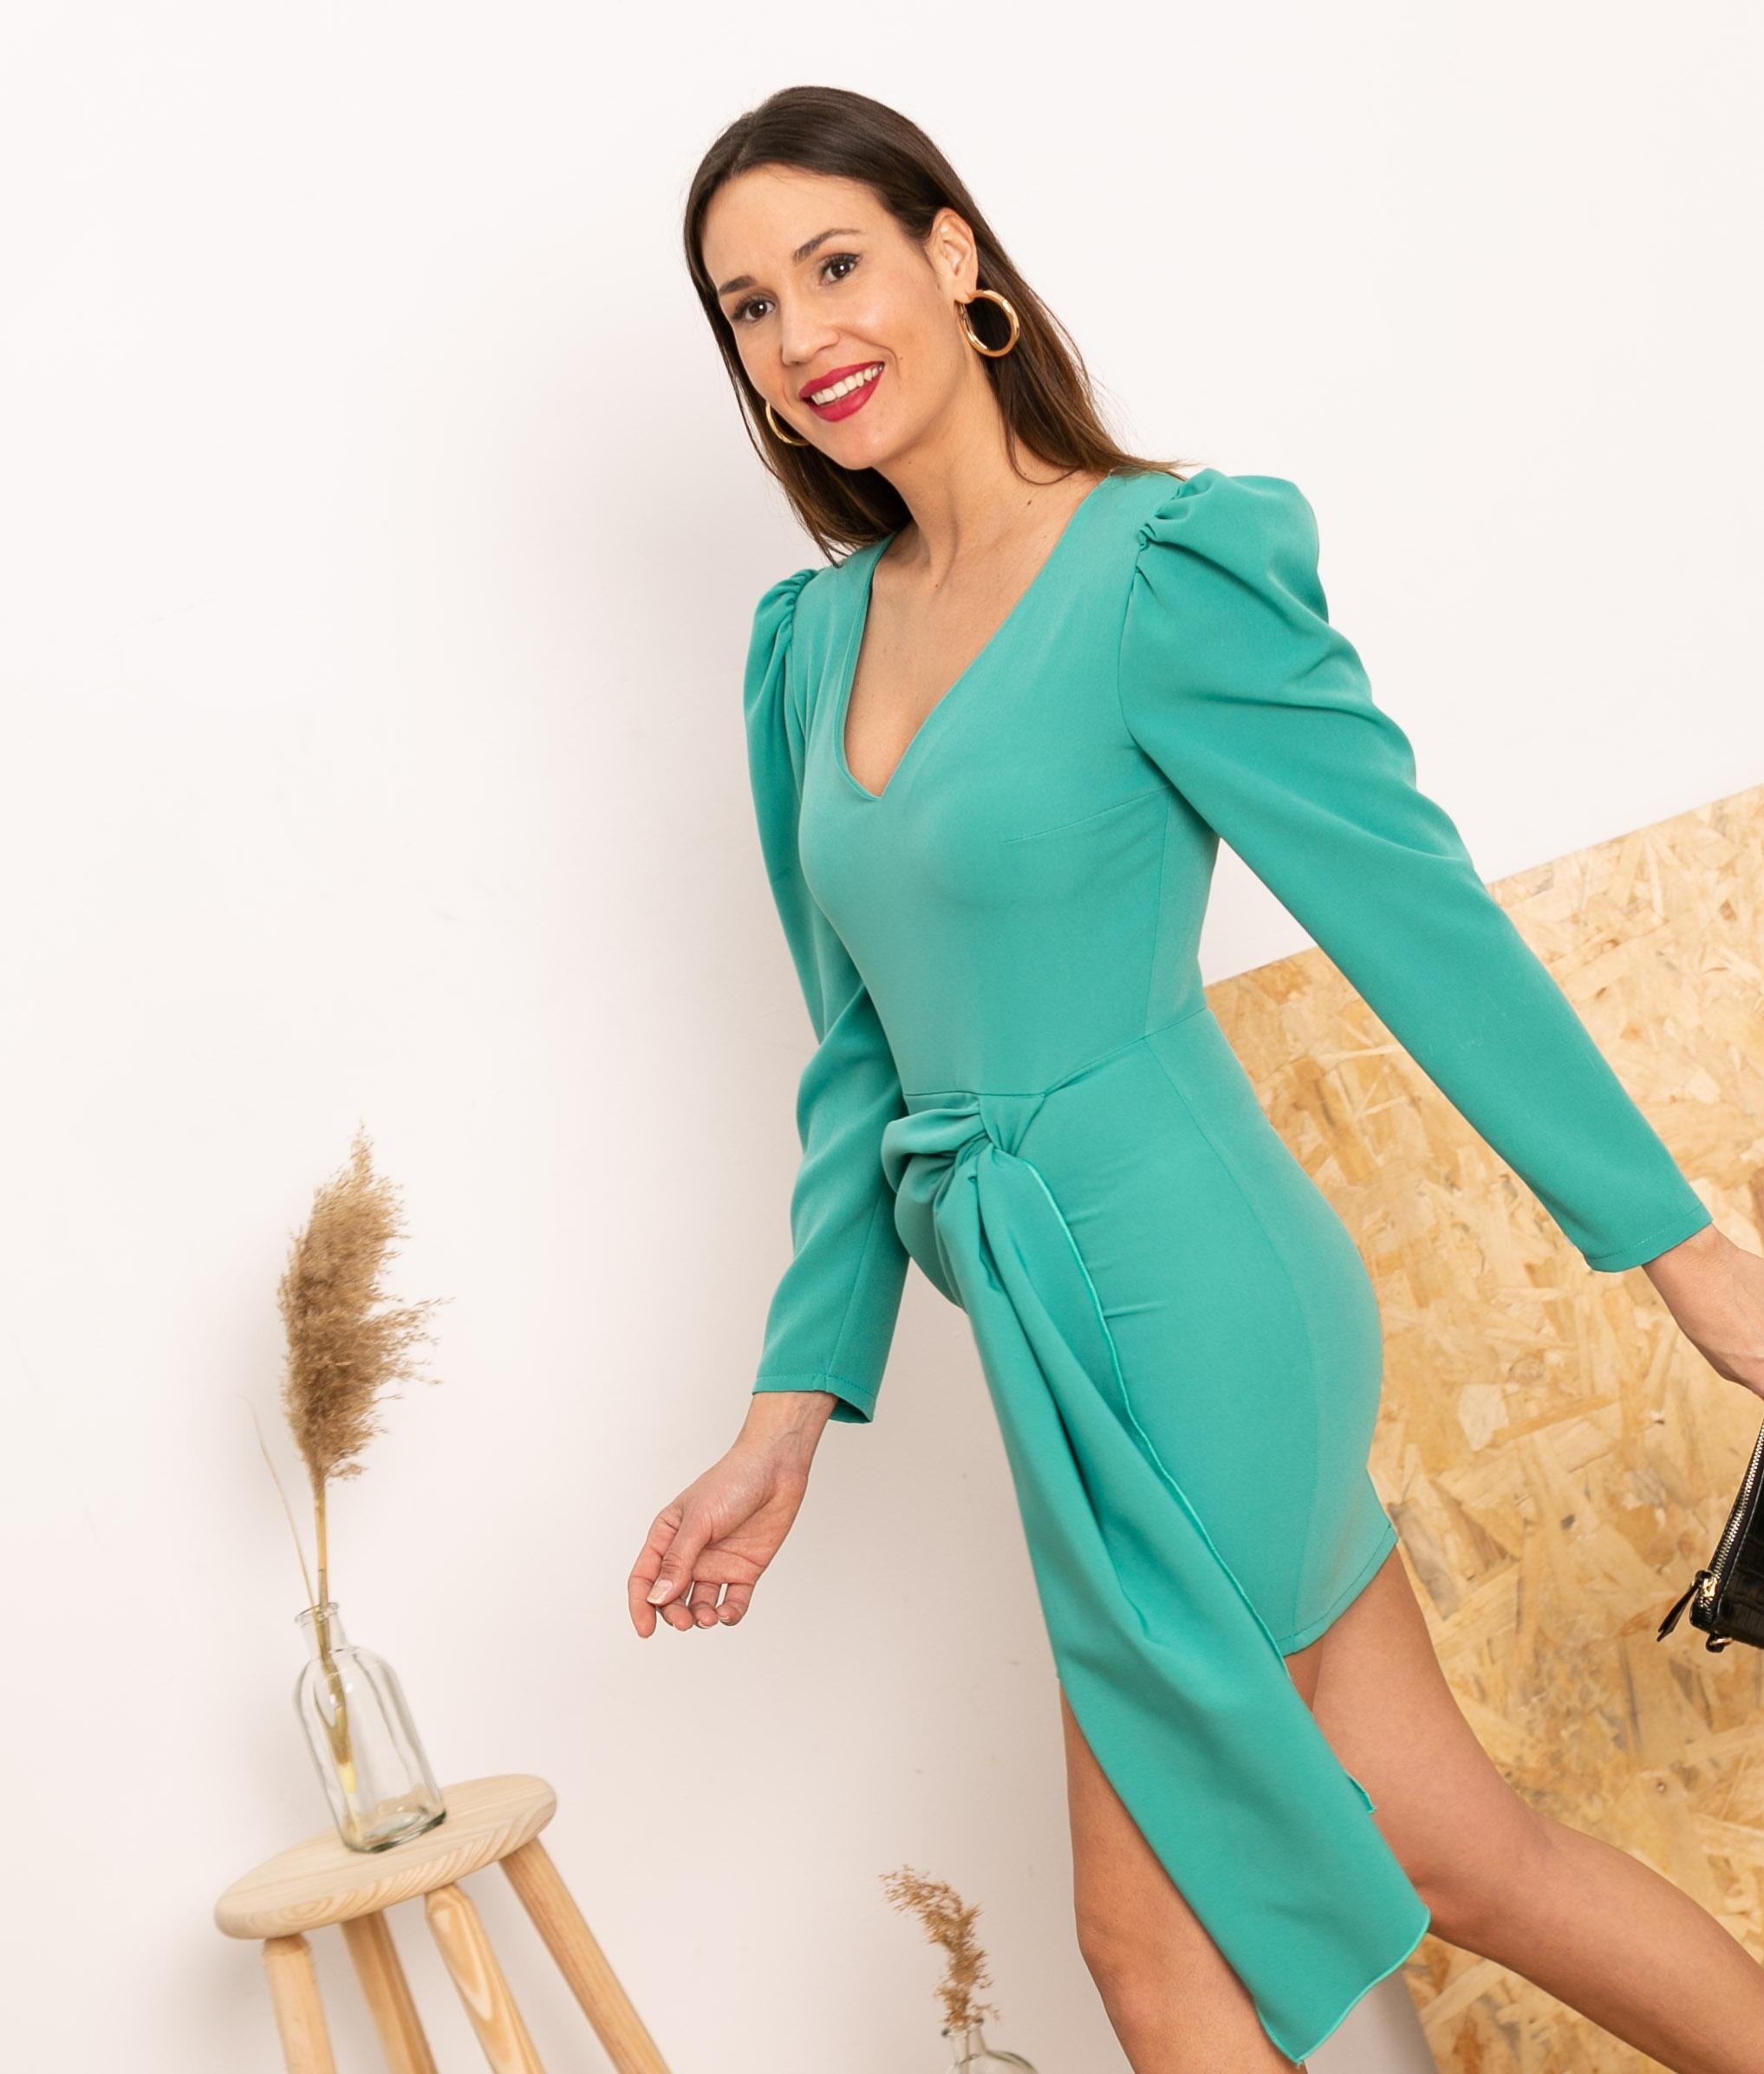 Vestido Cortes - Turquoise